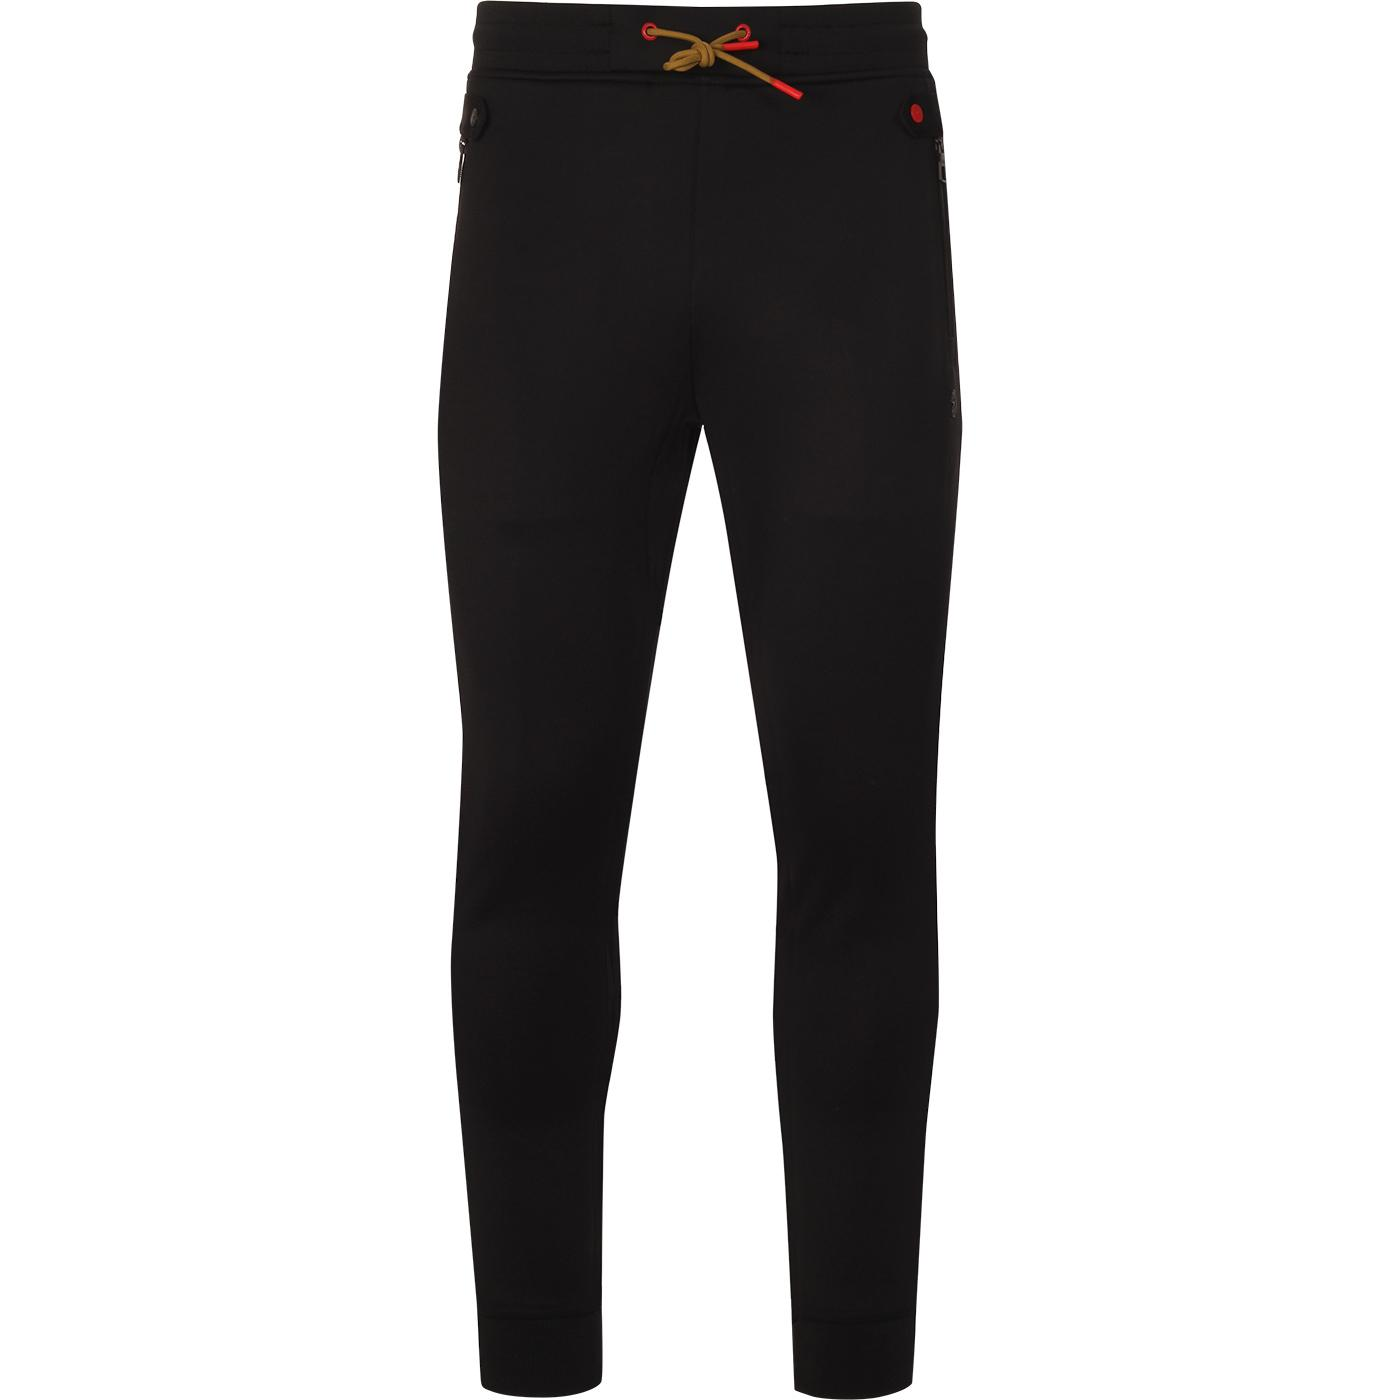 Straightnose LUKE Retro Cuffed Track Pants (Black)